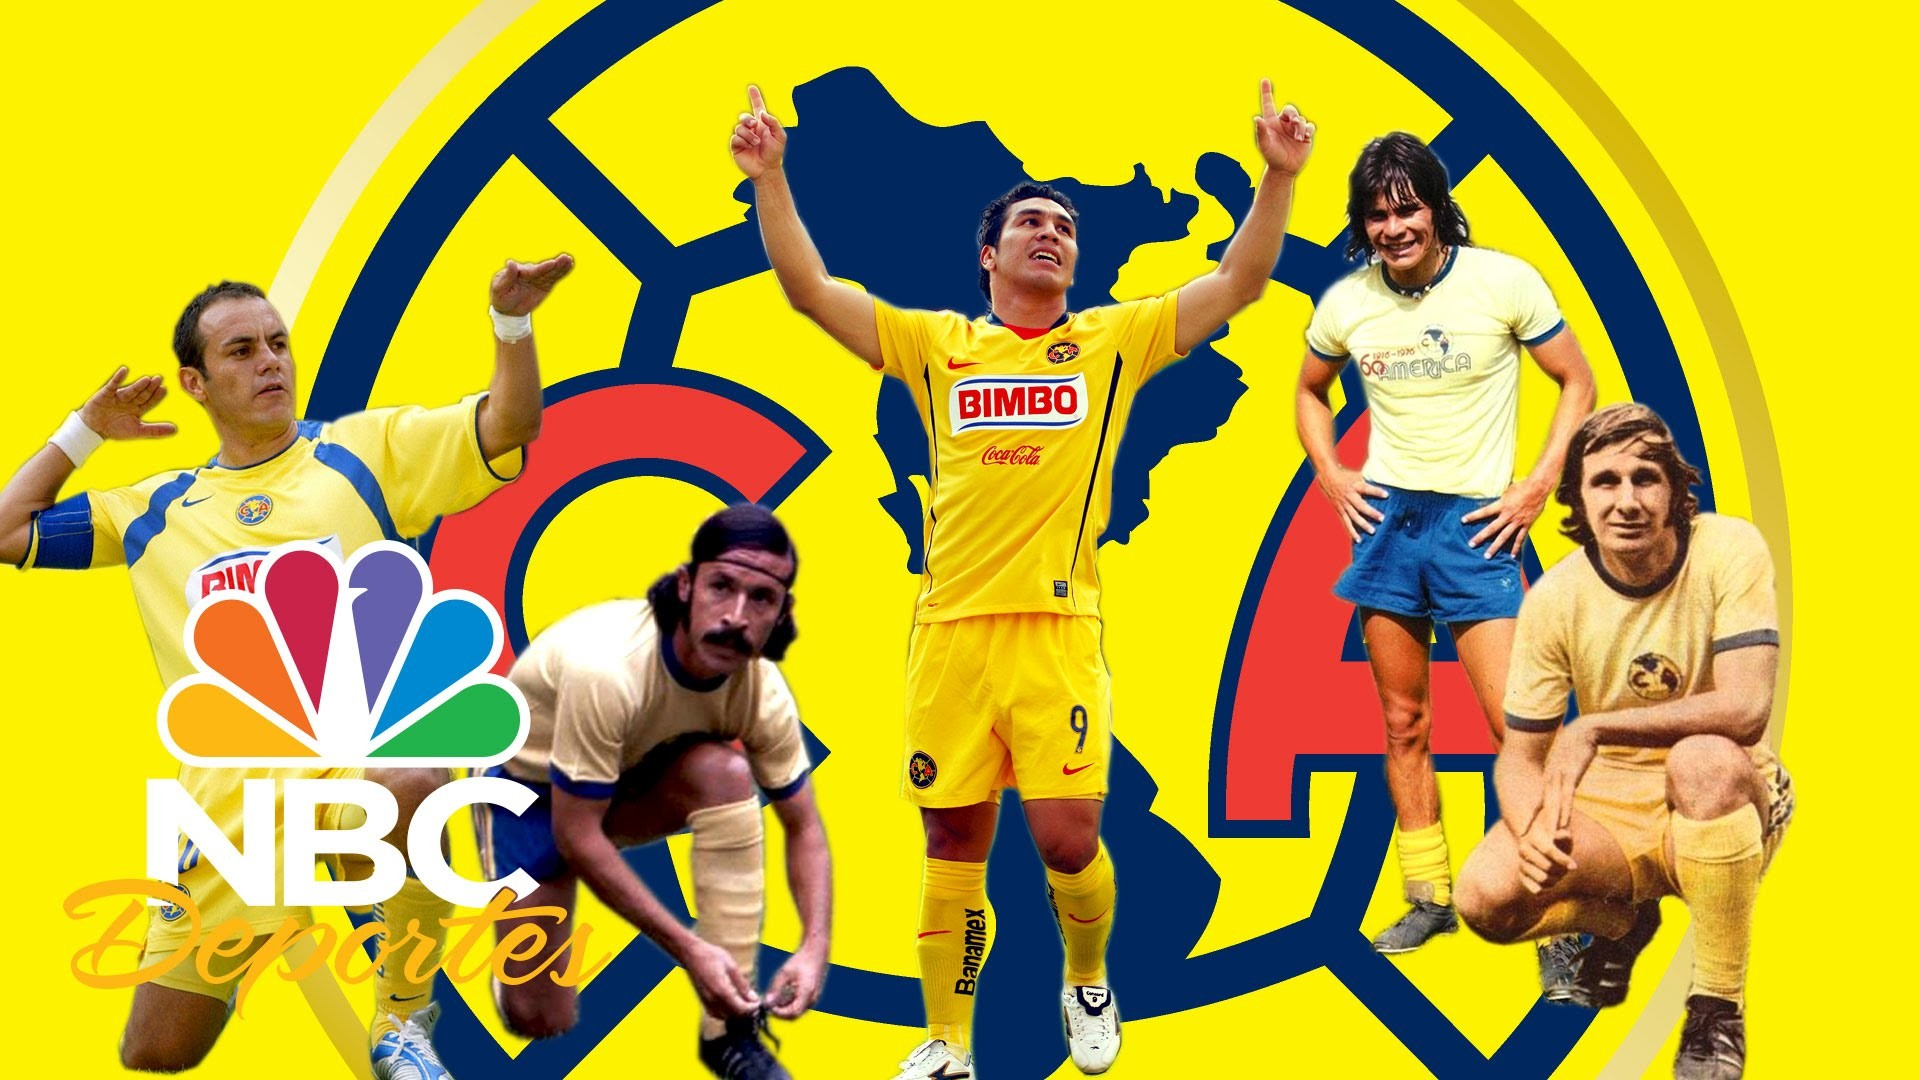 El 11 ideal histórico del Club América | NBC Deportes | NBC Deportes –  YouTube